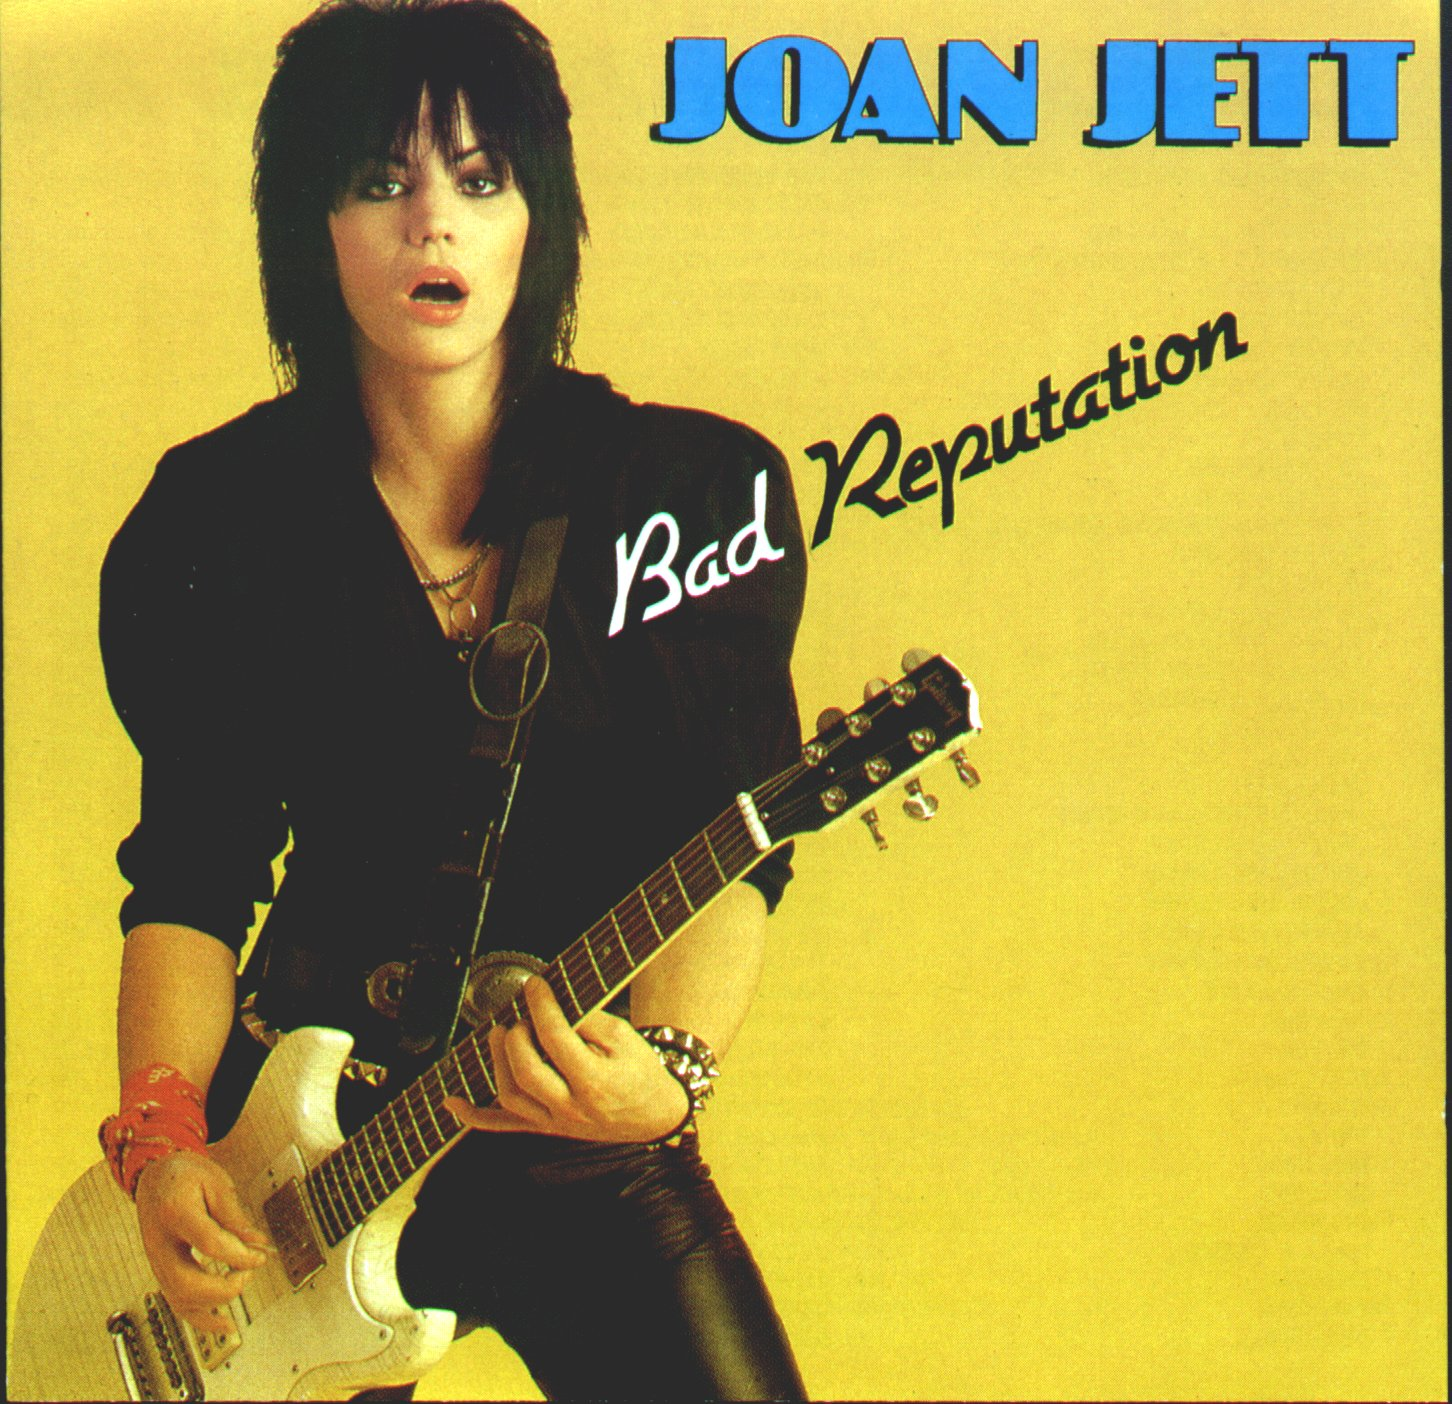 http://3.bp.blogspot.com/_SWKGhM2mbB4/SwWlcTp-BII/AAAAAAAAAkA/YUPQjKKJXdc/s1600/Joan+Jett-+Bad+Reputation+-+front.jpg